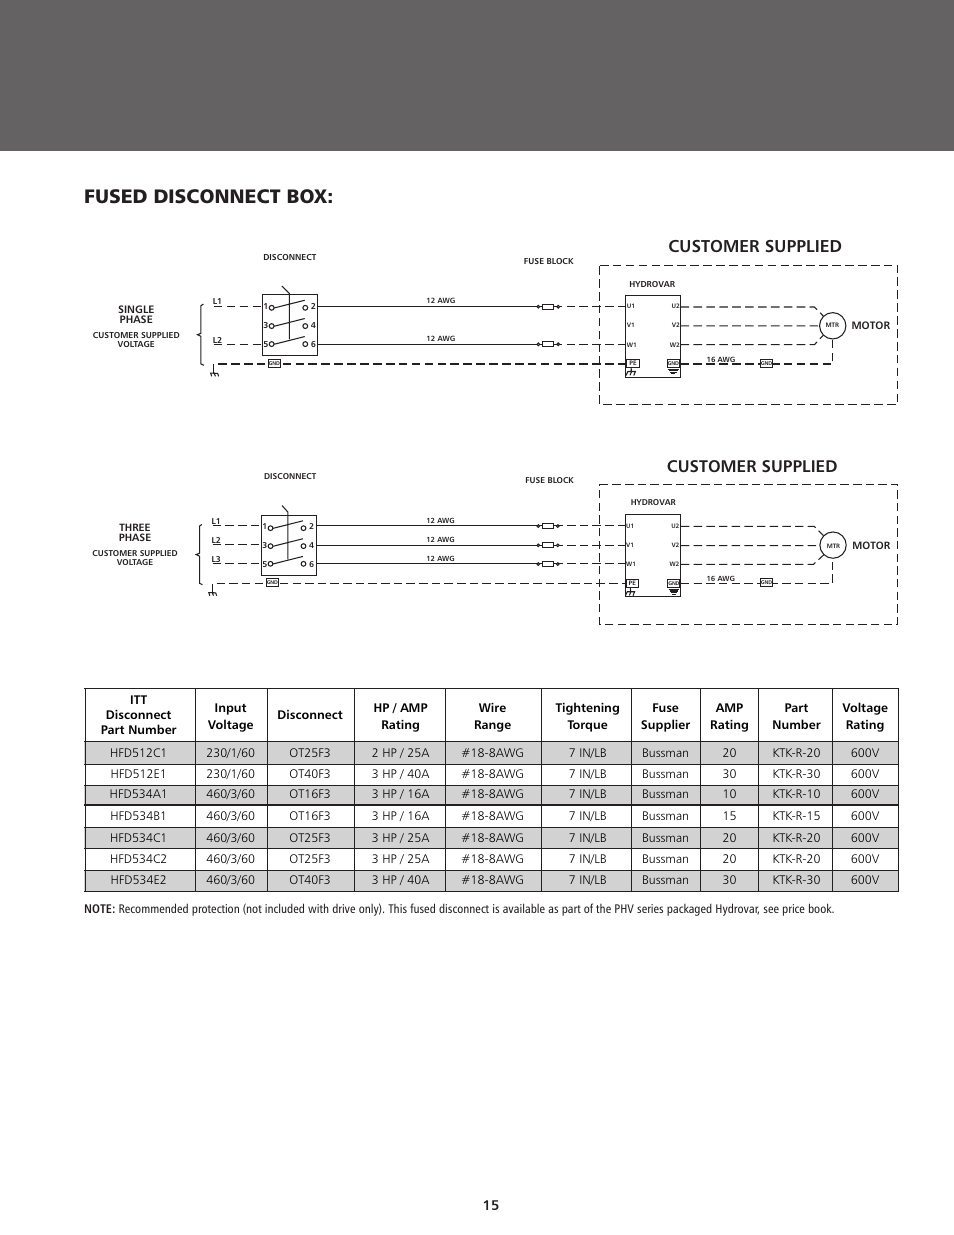 Itt user manual user guide manual that easy to read fused disconnect box customer supplied itt bphv user manual rh manualsdir com manuals in pdf instruction manual book fandeluxe Gallery